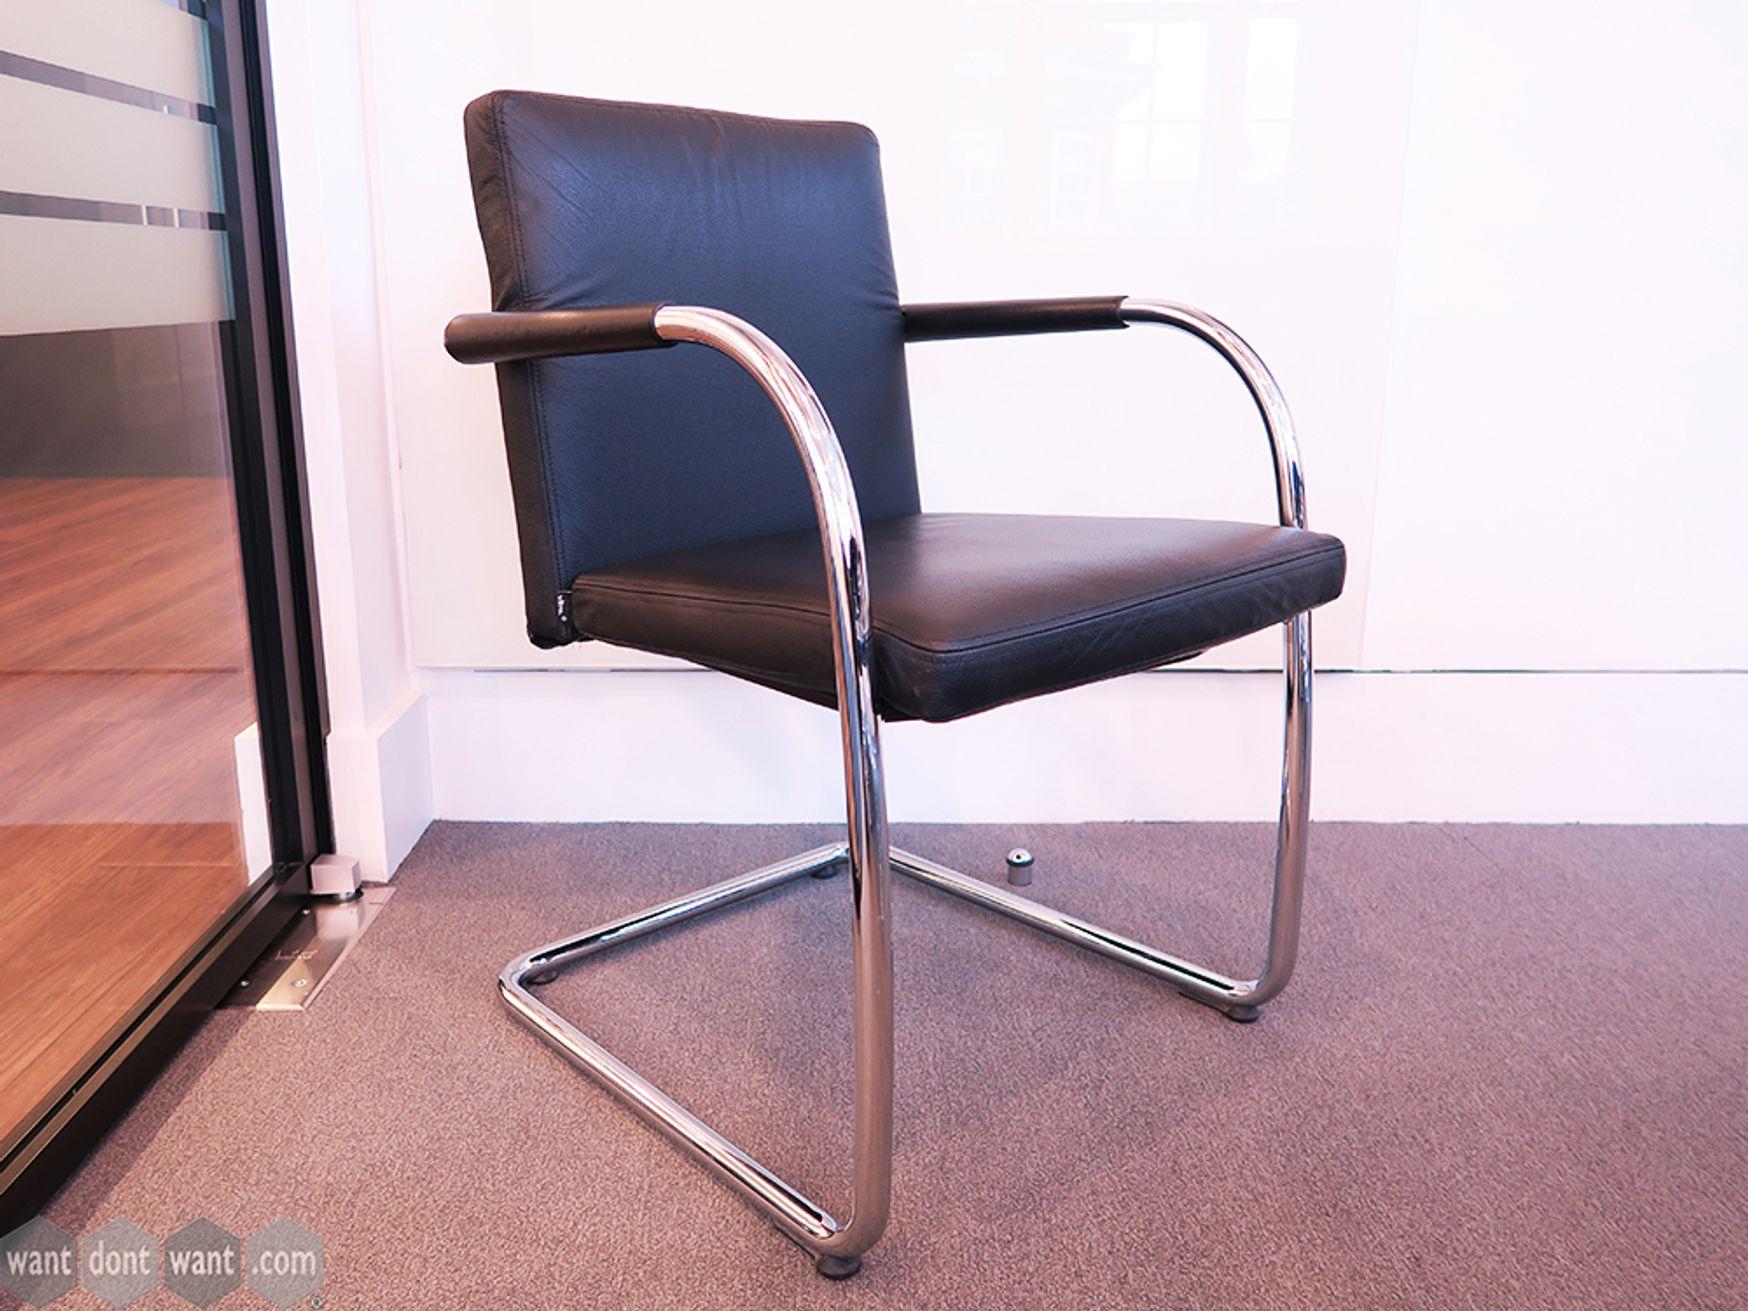 Used Vitra 'Visasoft' Black Leather Boardroom Chairs